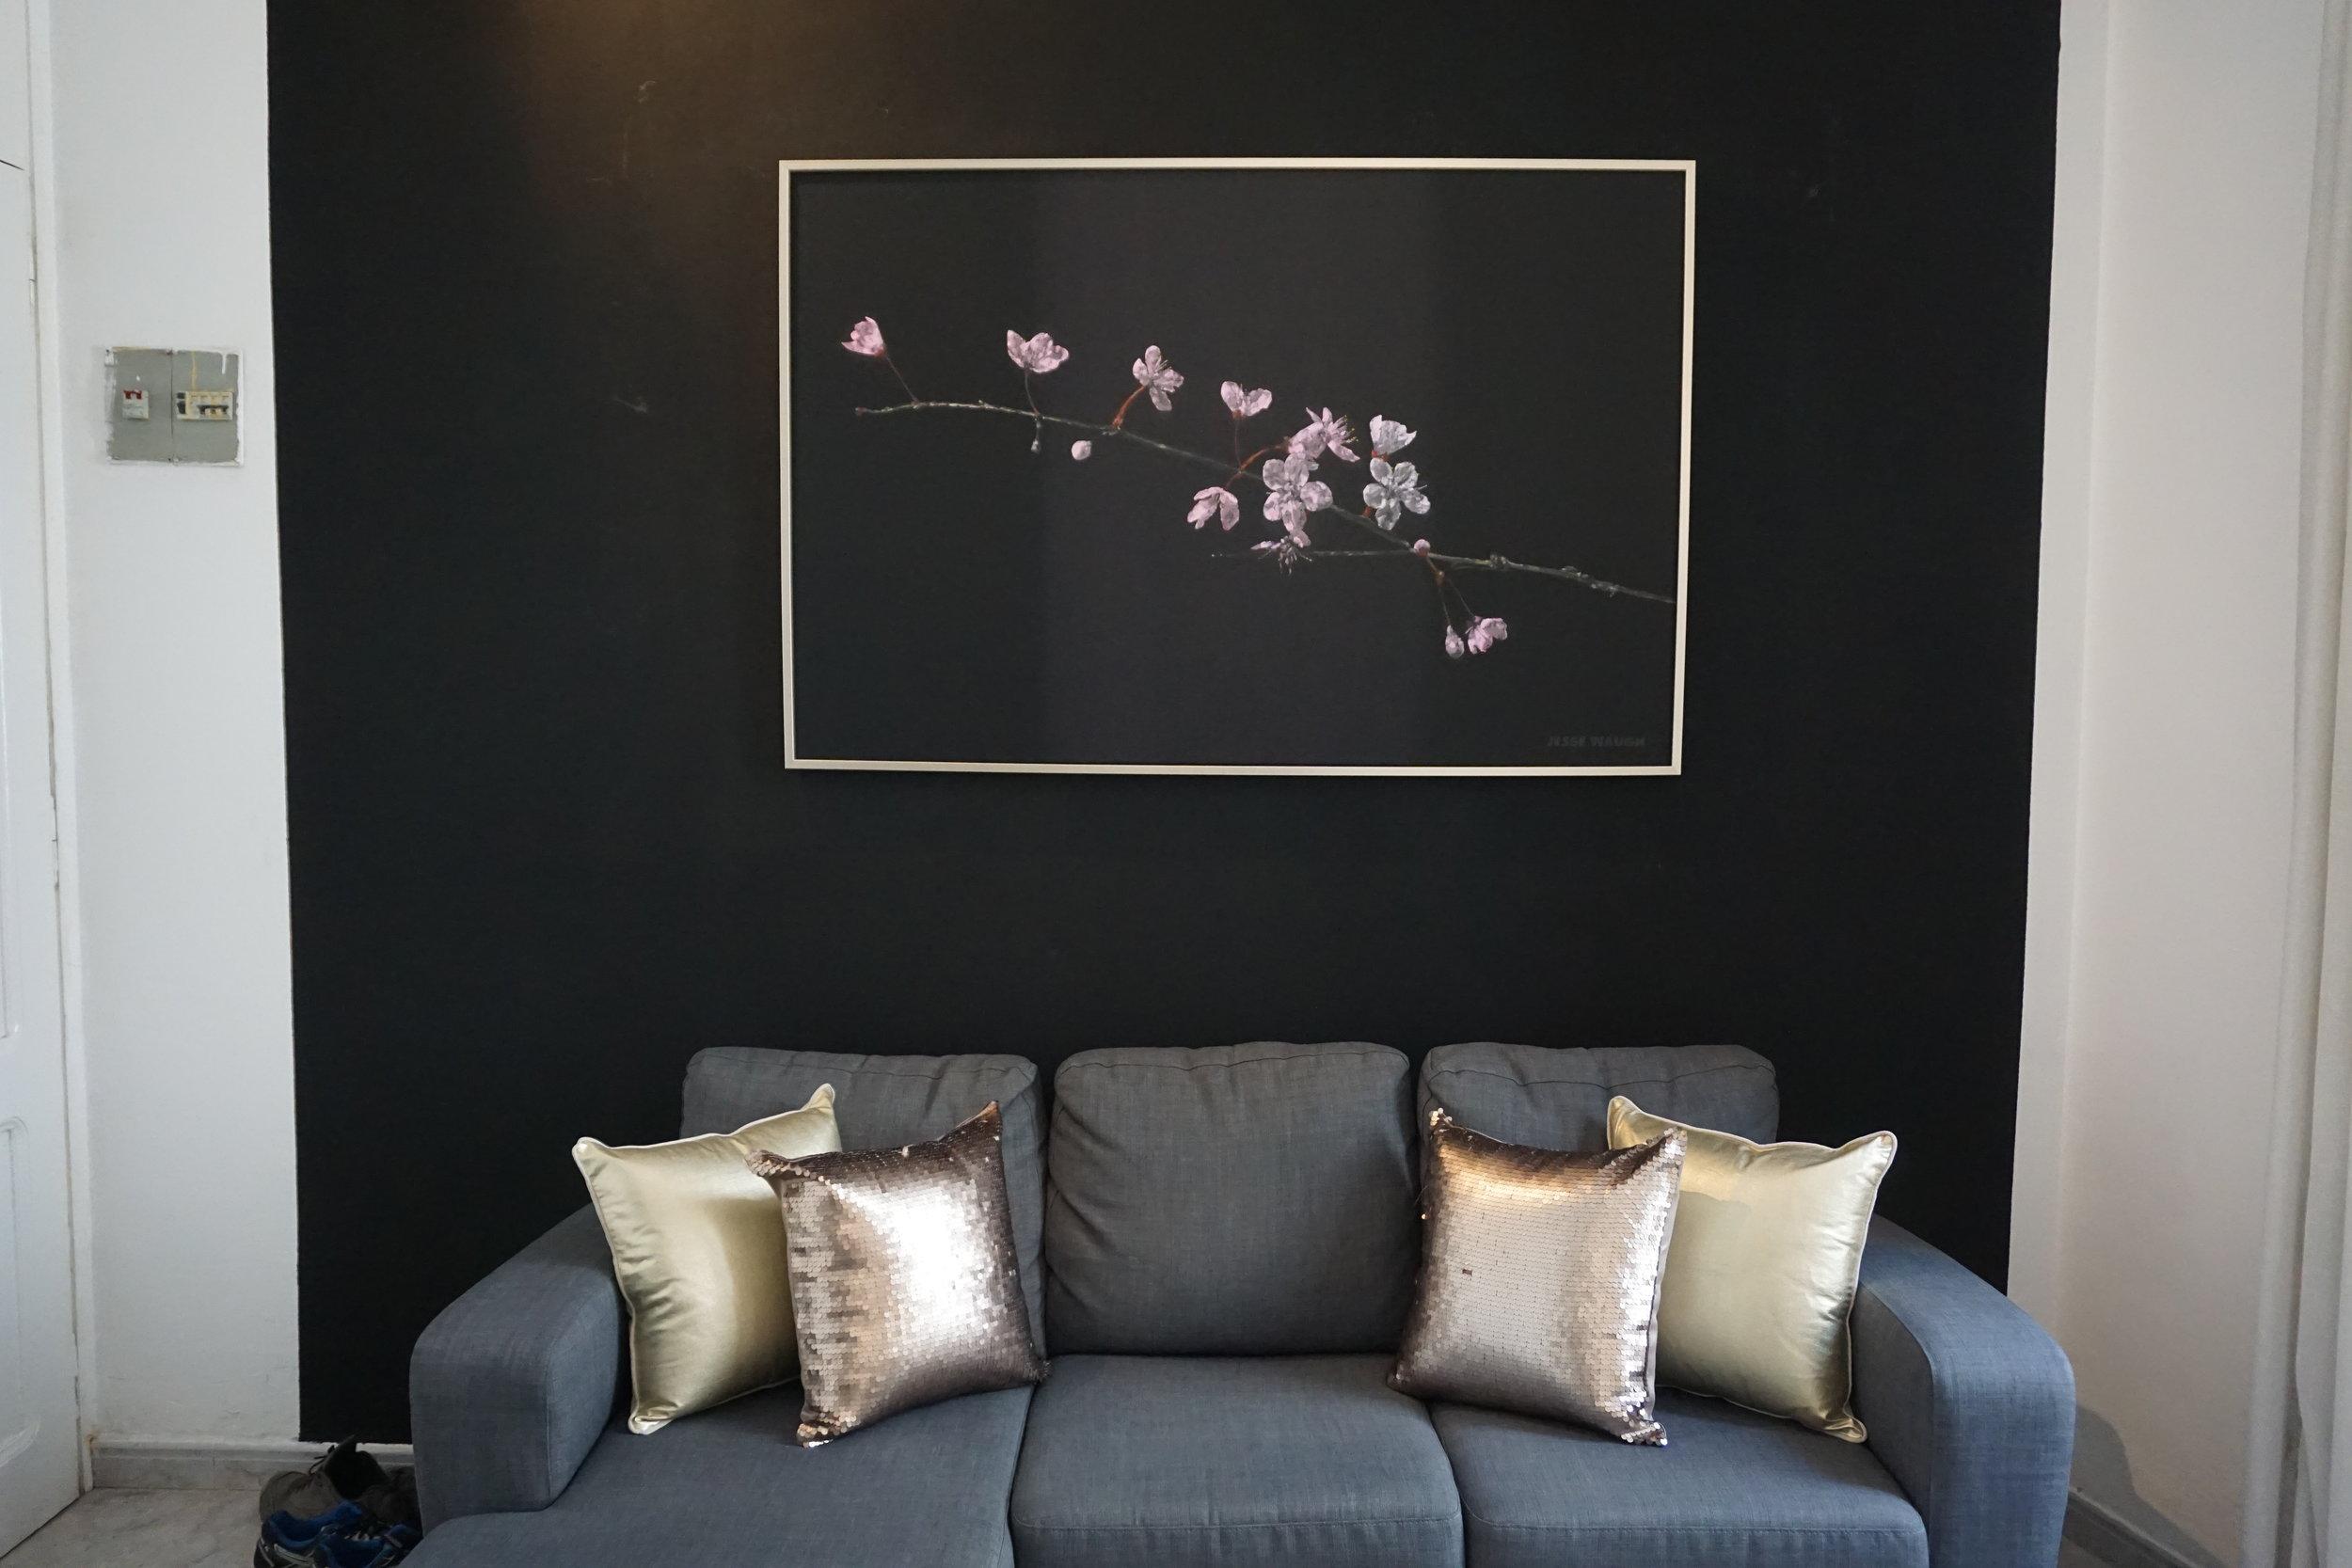 2017-04-22-Cherry-Blossoms-adytum-JESSE-WAUGH-jessewaugh.com-INTERIOR.JPG